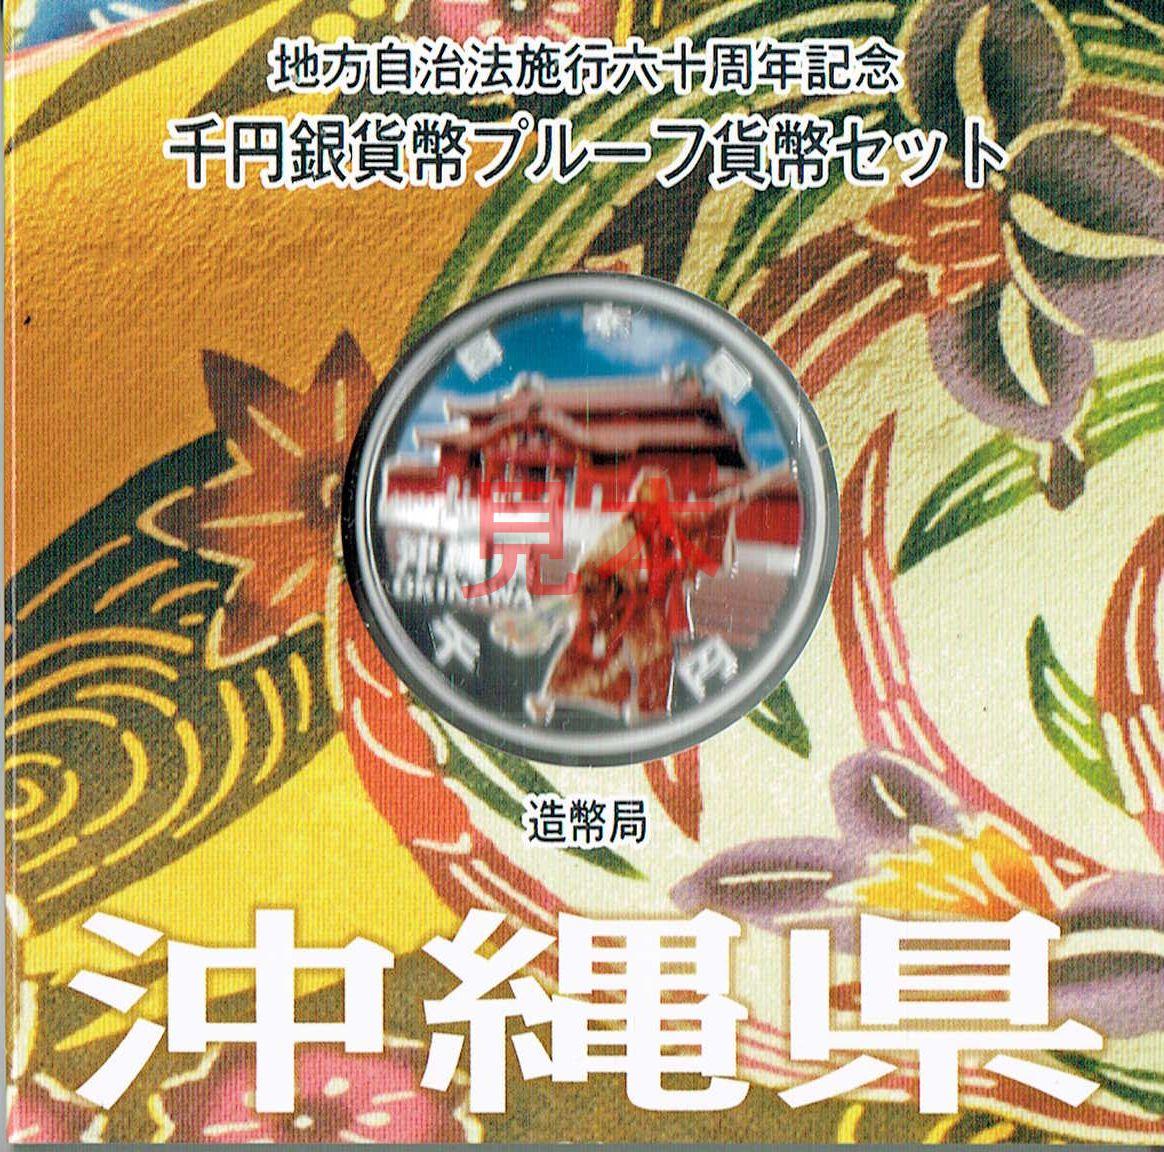 商品名「地方自治法施行60周年記念千円銀貨幣プルーフ Aセット 沖縄県」